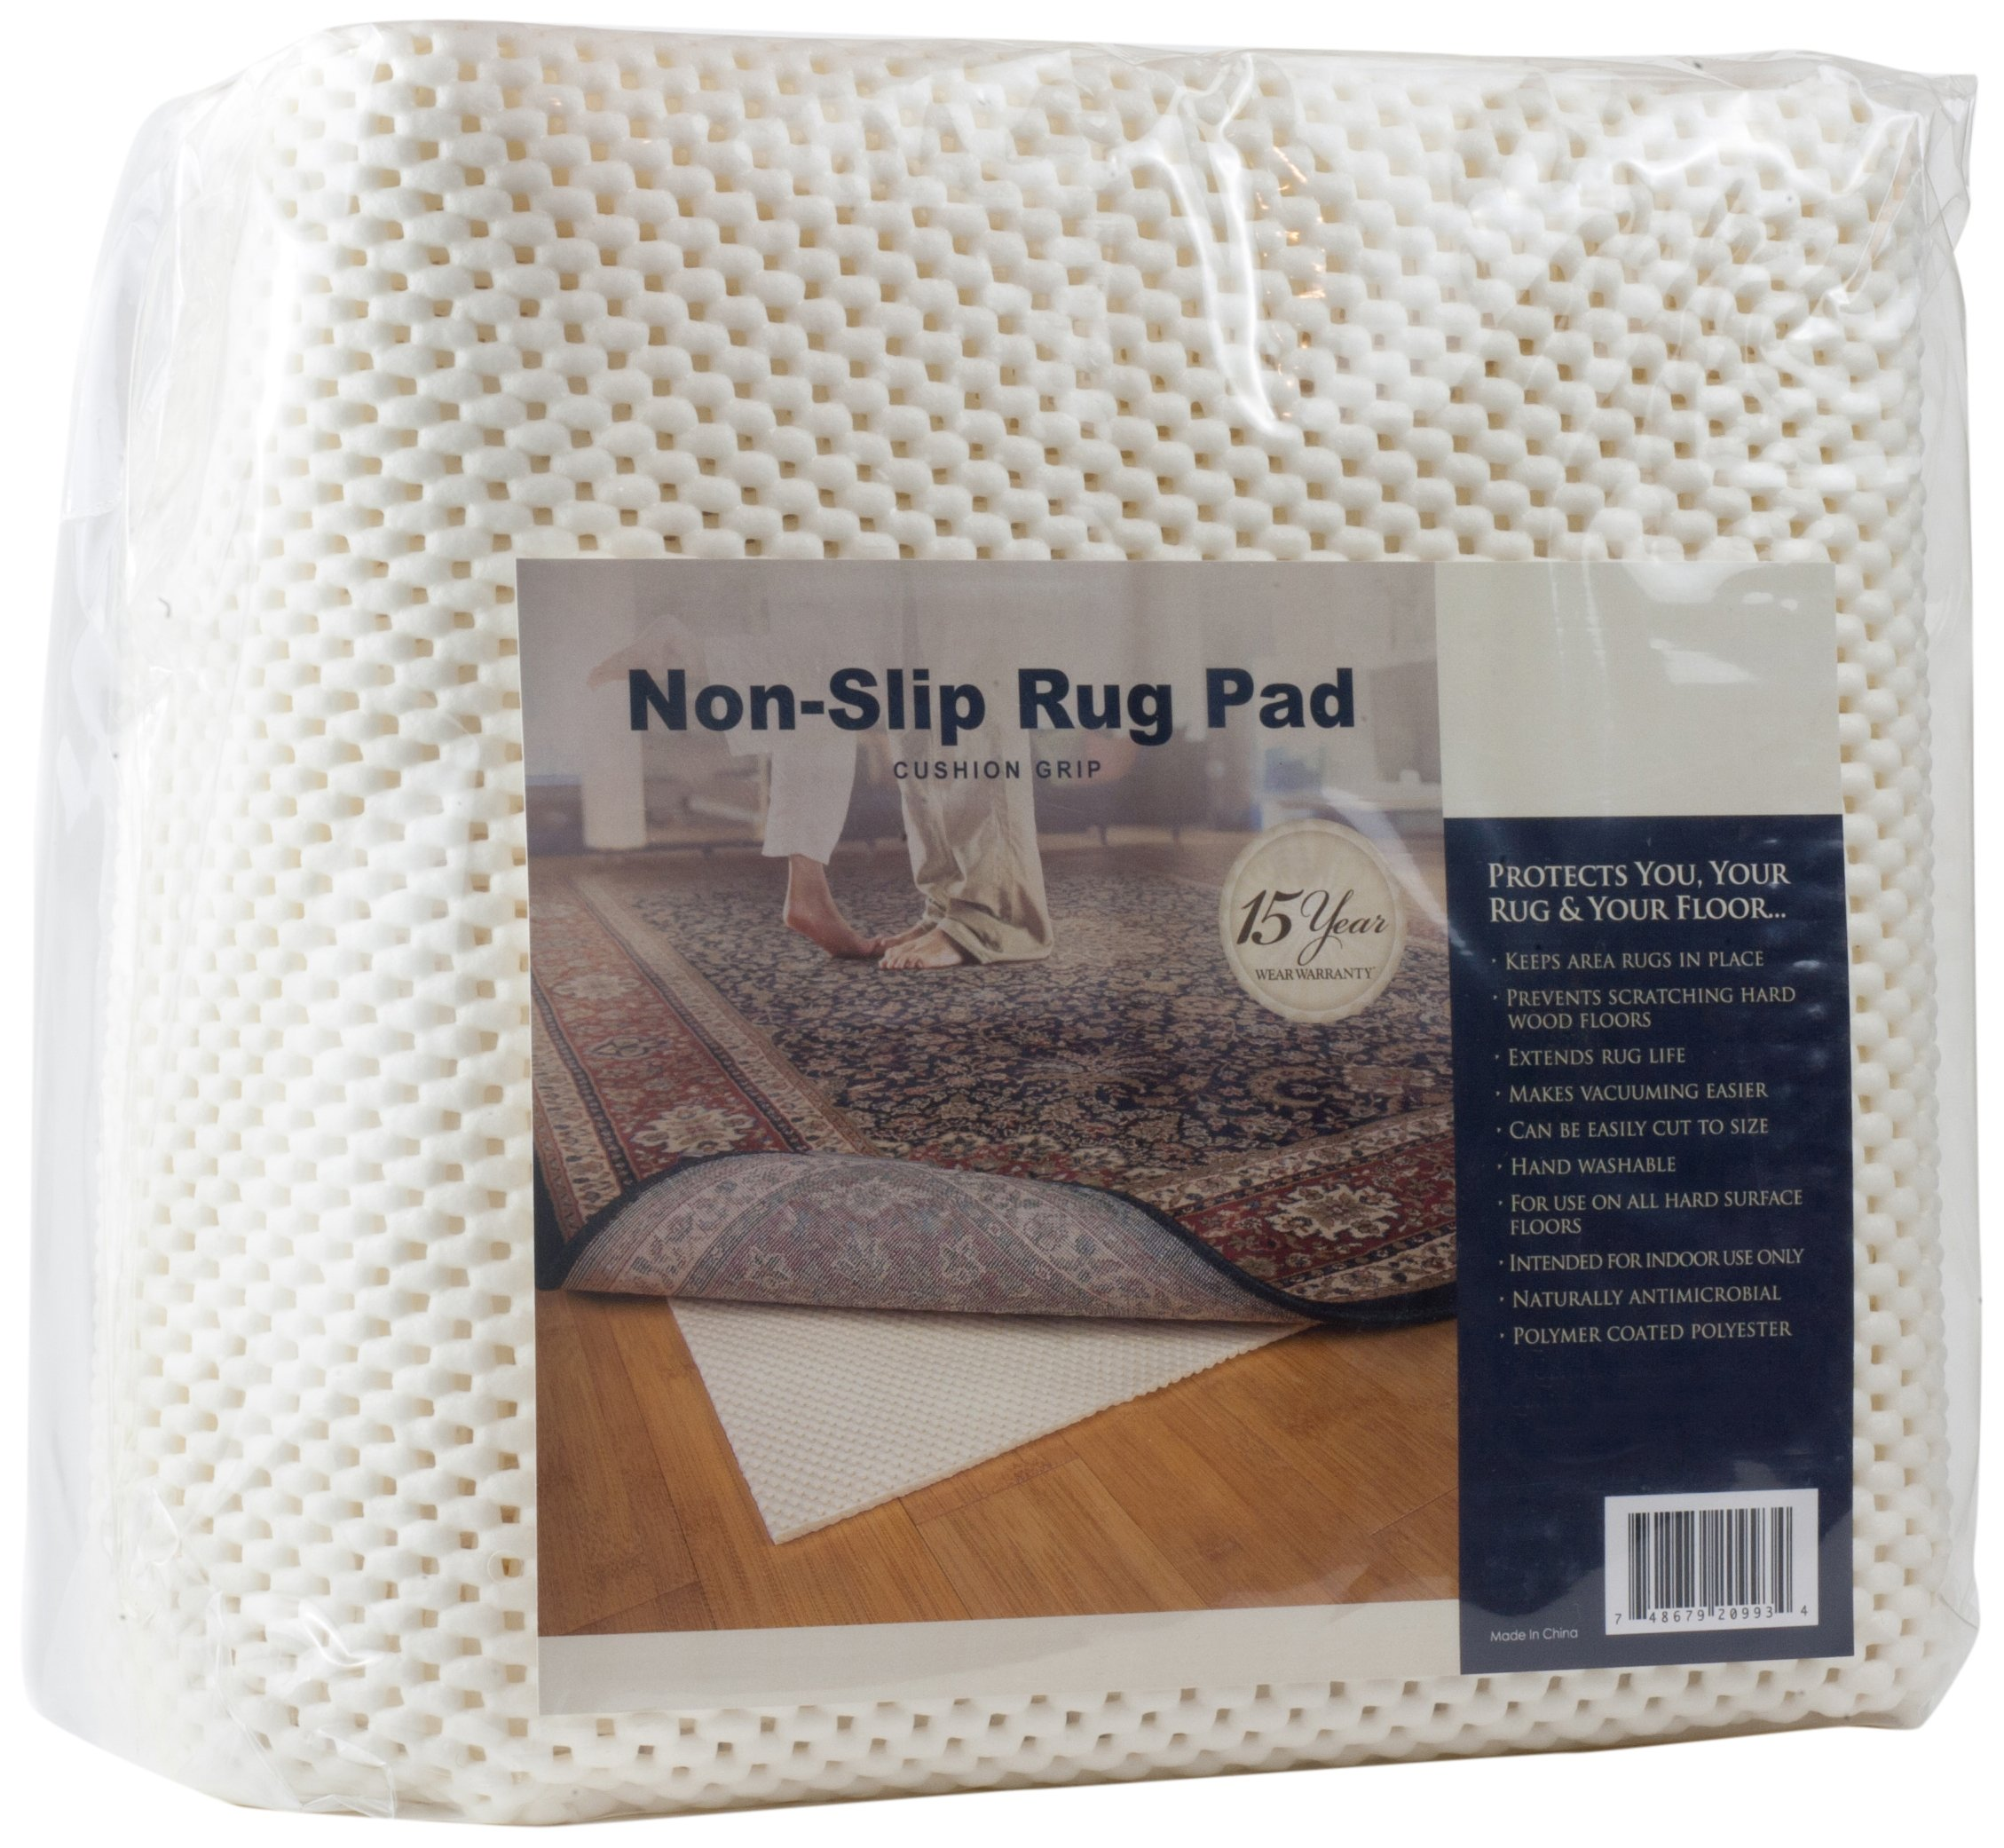 Cushion Grip Non-skid Area Rug Pad For 9-Feet By 12-Feet